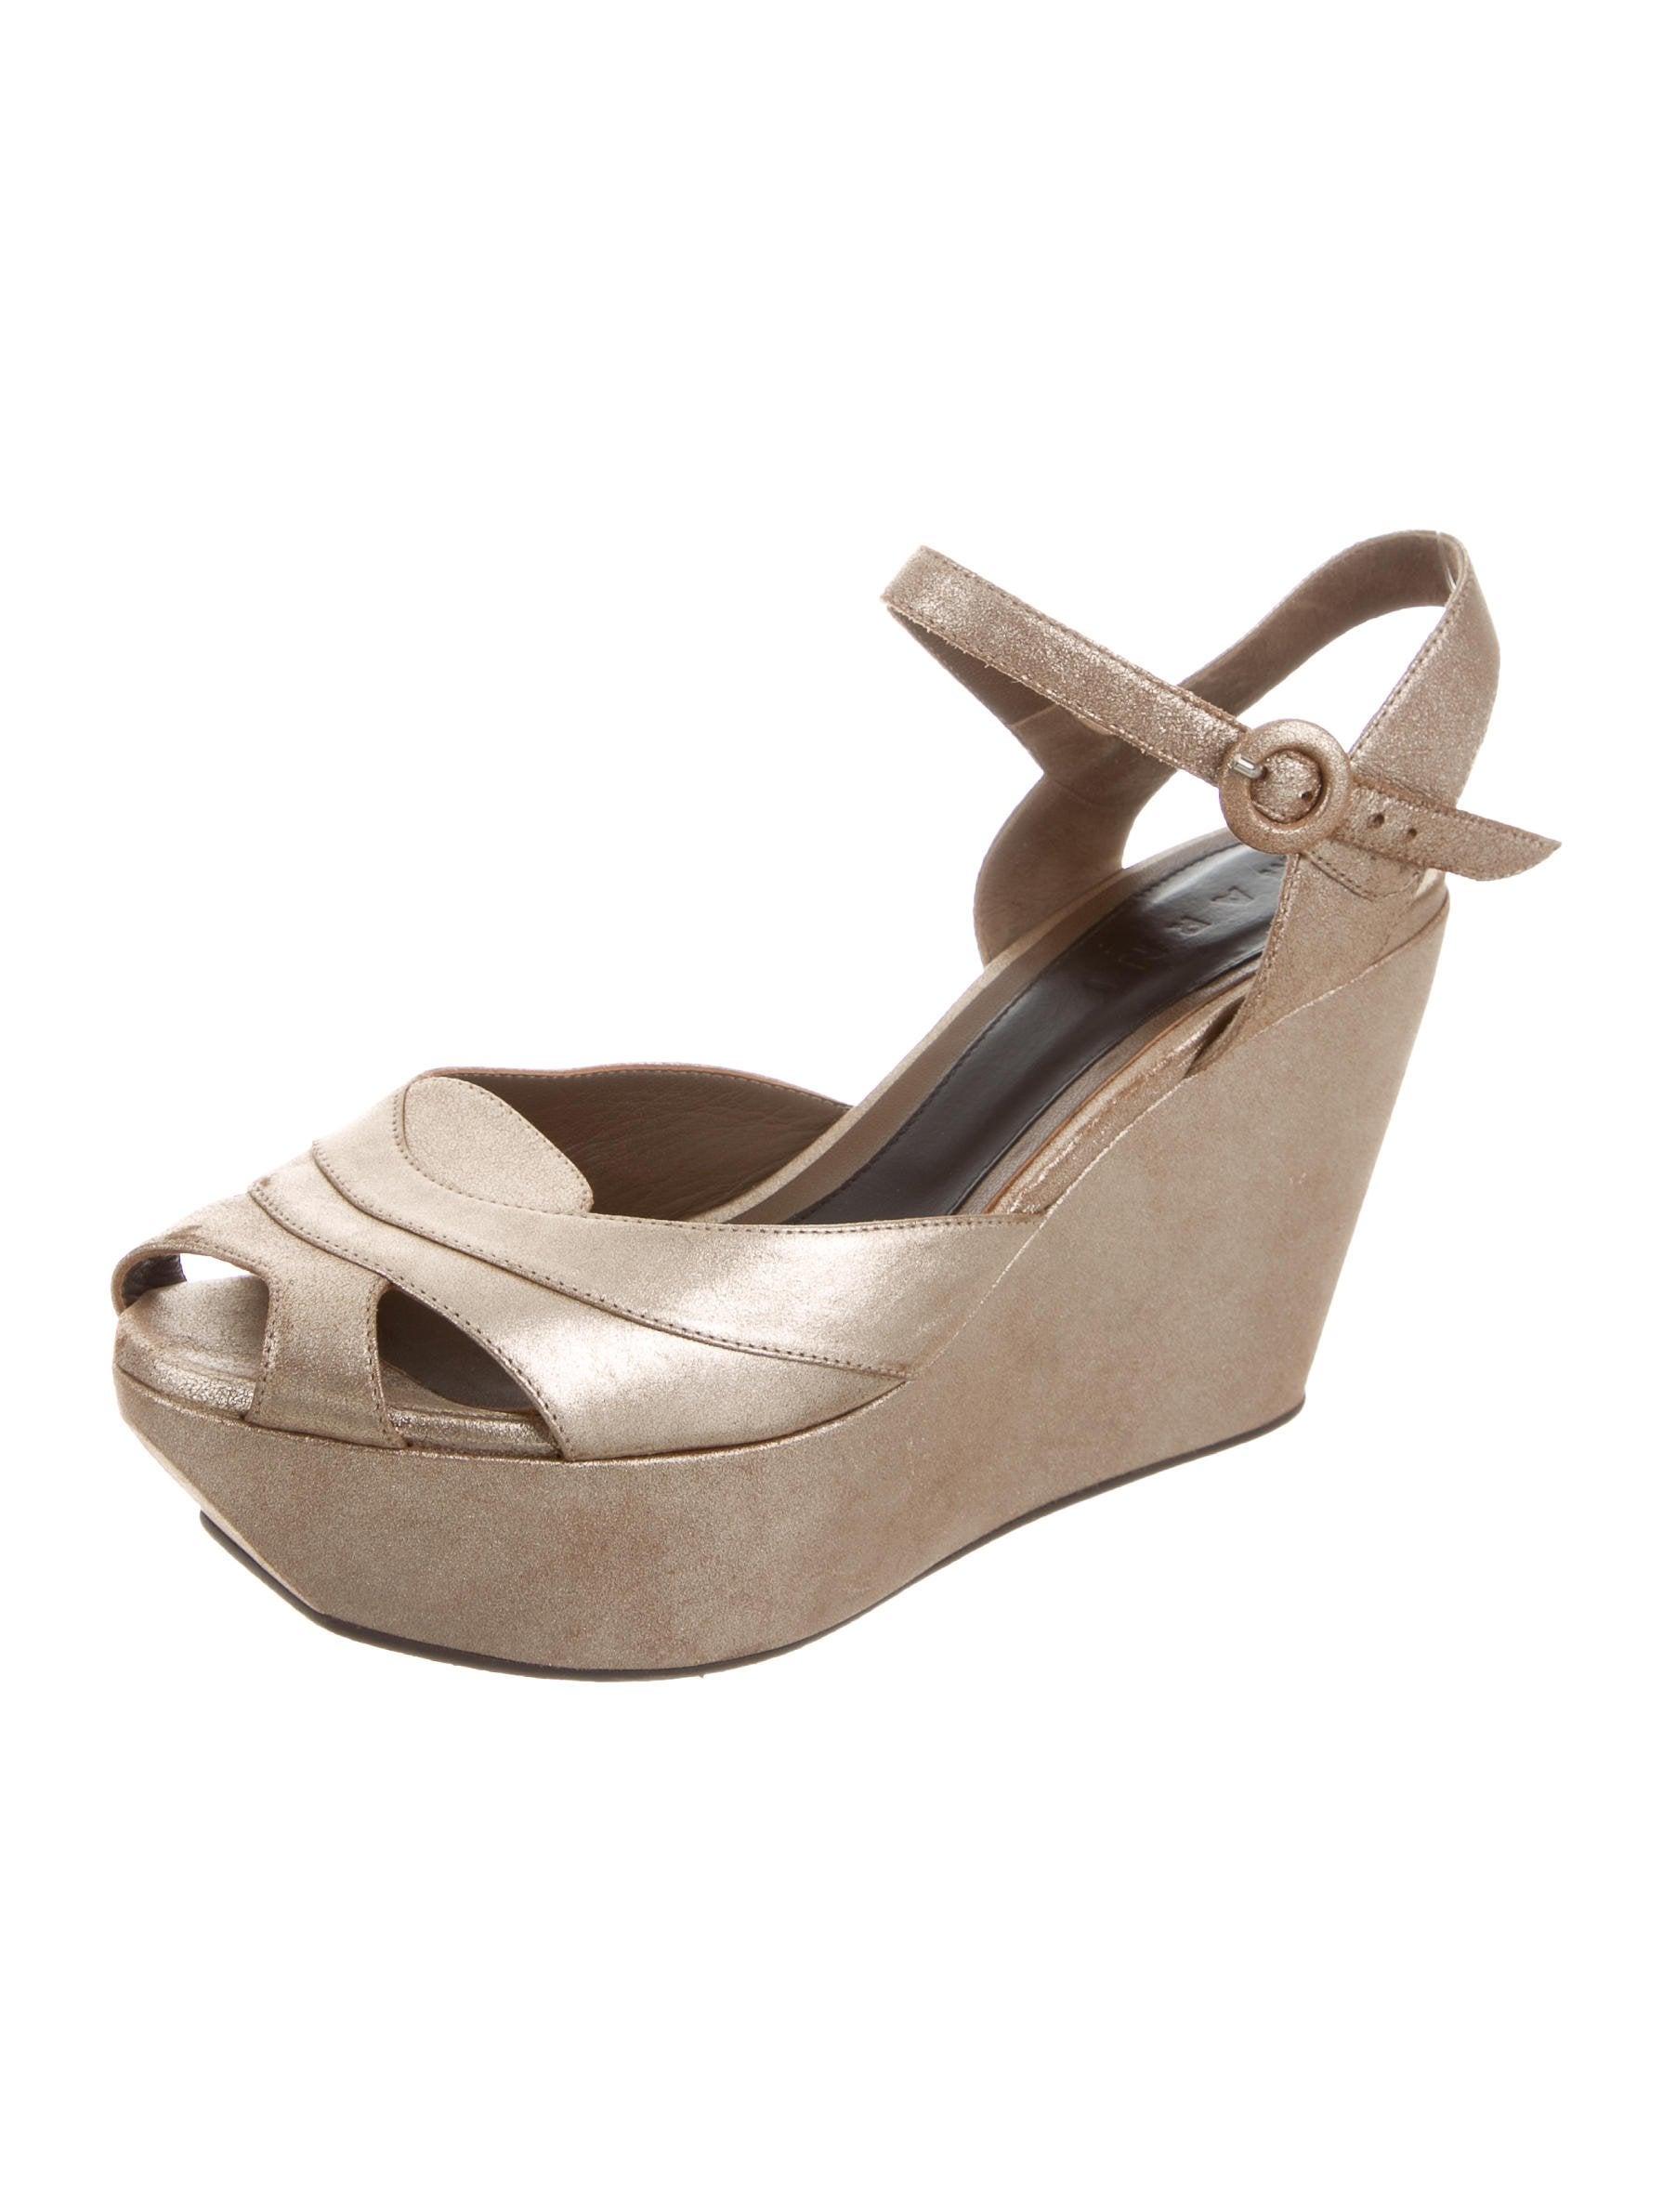 marni metallic platform sandals shoes man56317 the